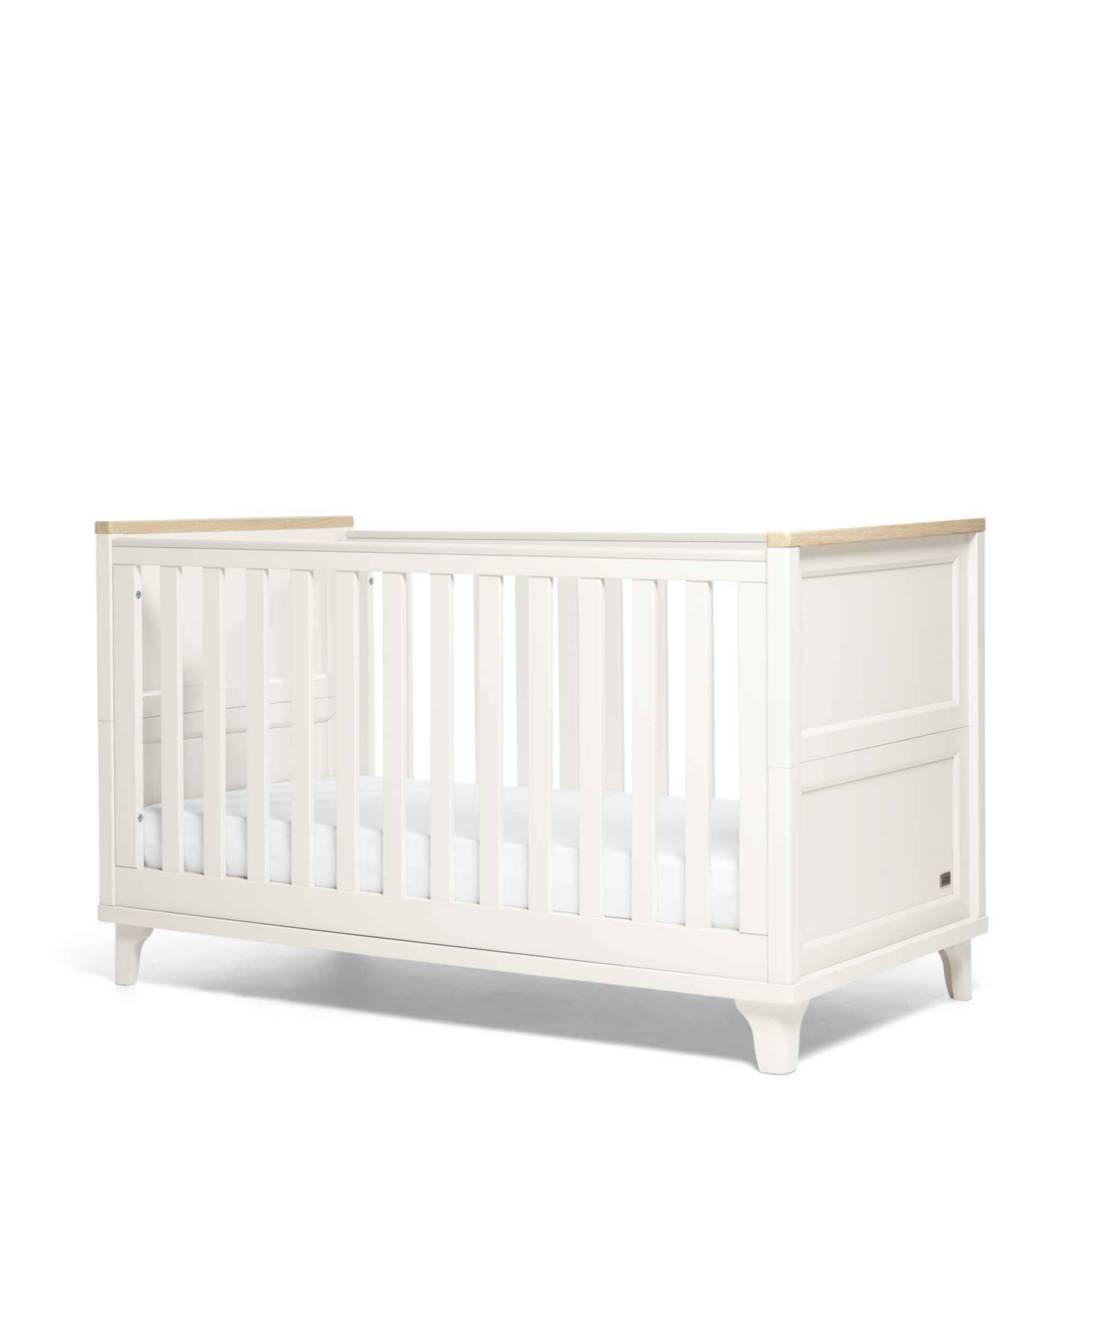 c64d559abb0 Παιδικό δωμάτιο - Lapin House